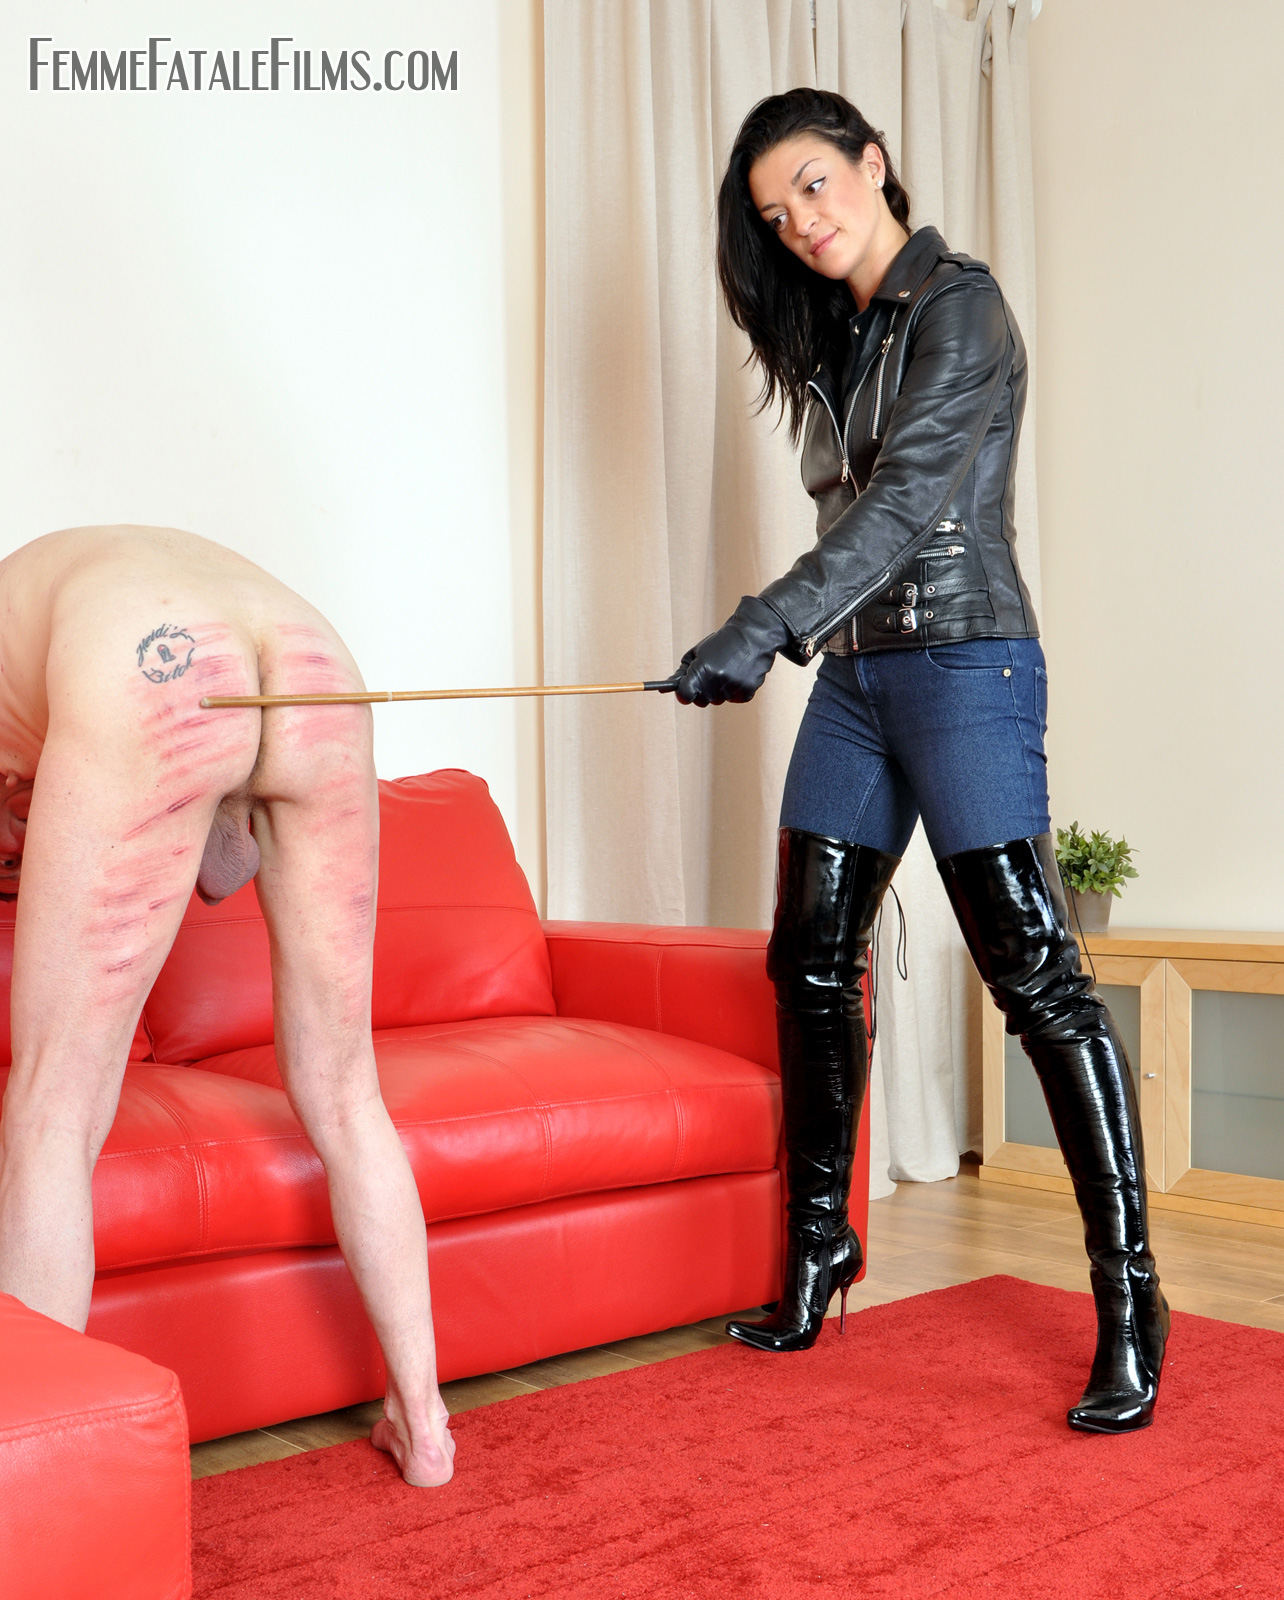 fetish ladies leather boots